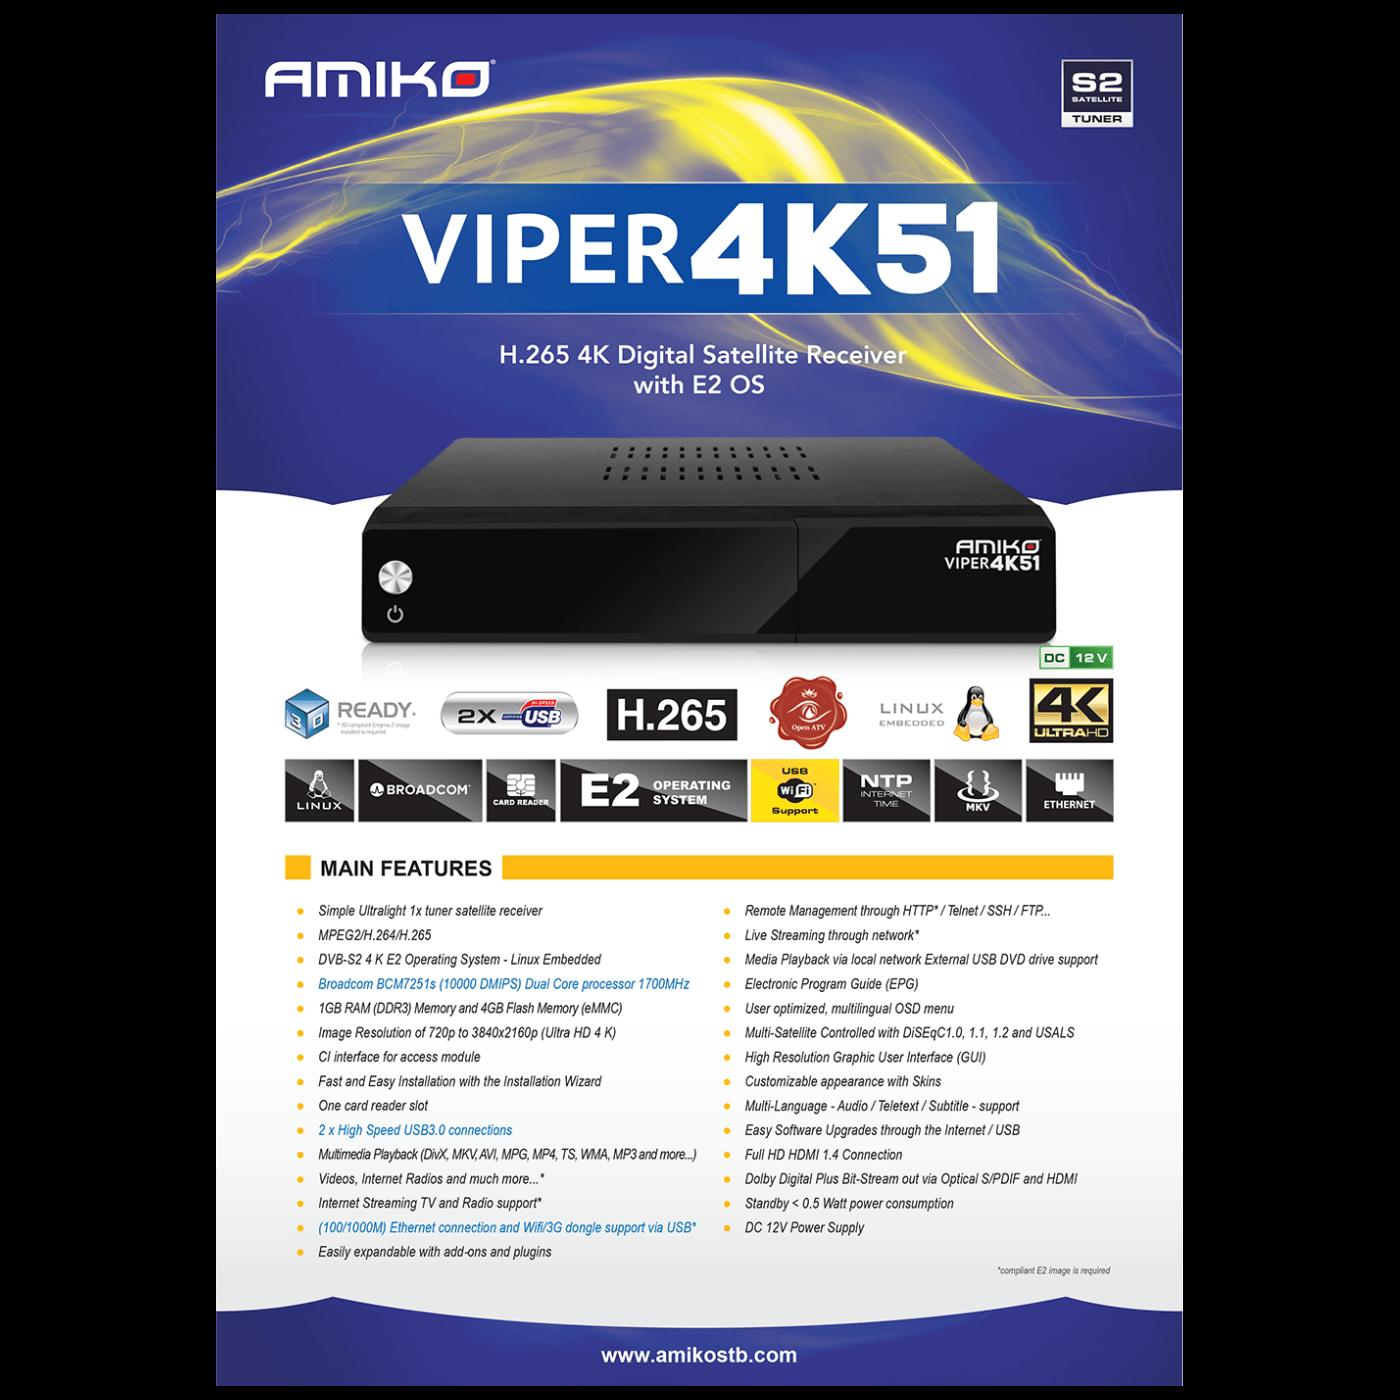 Viper 4K51